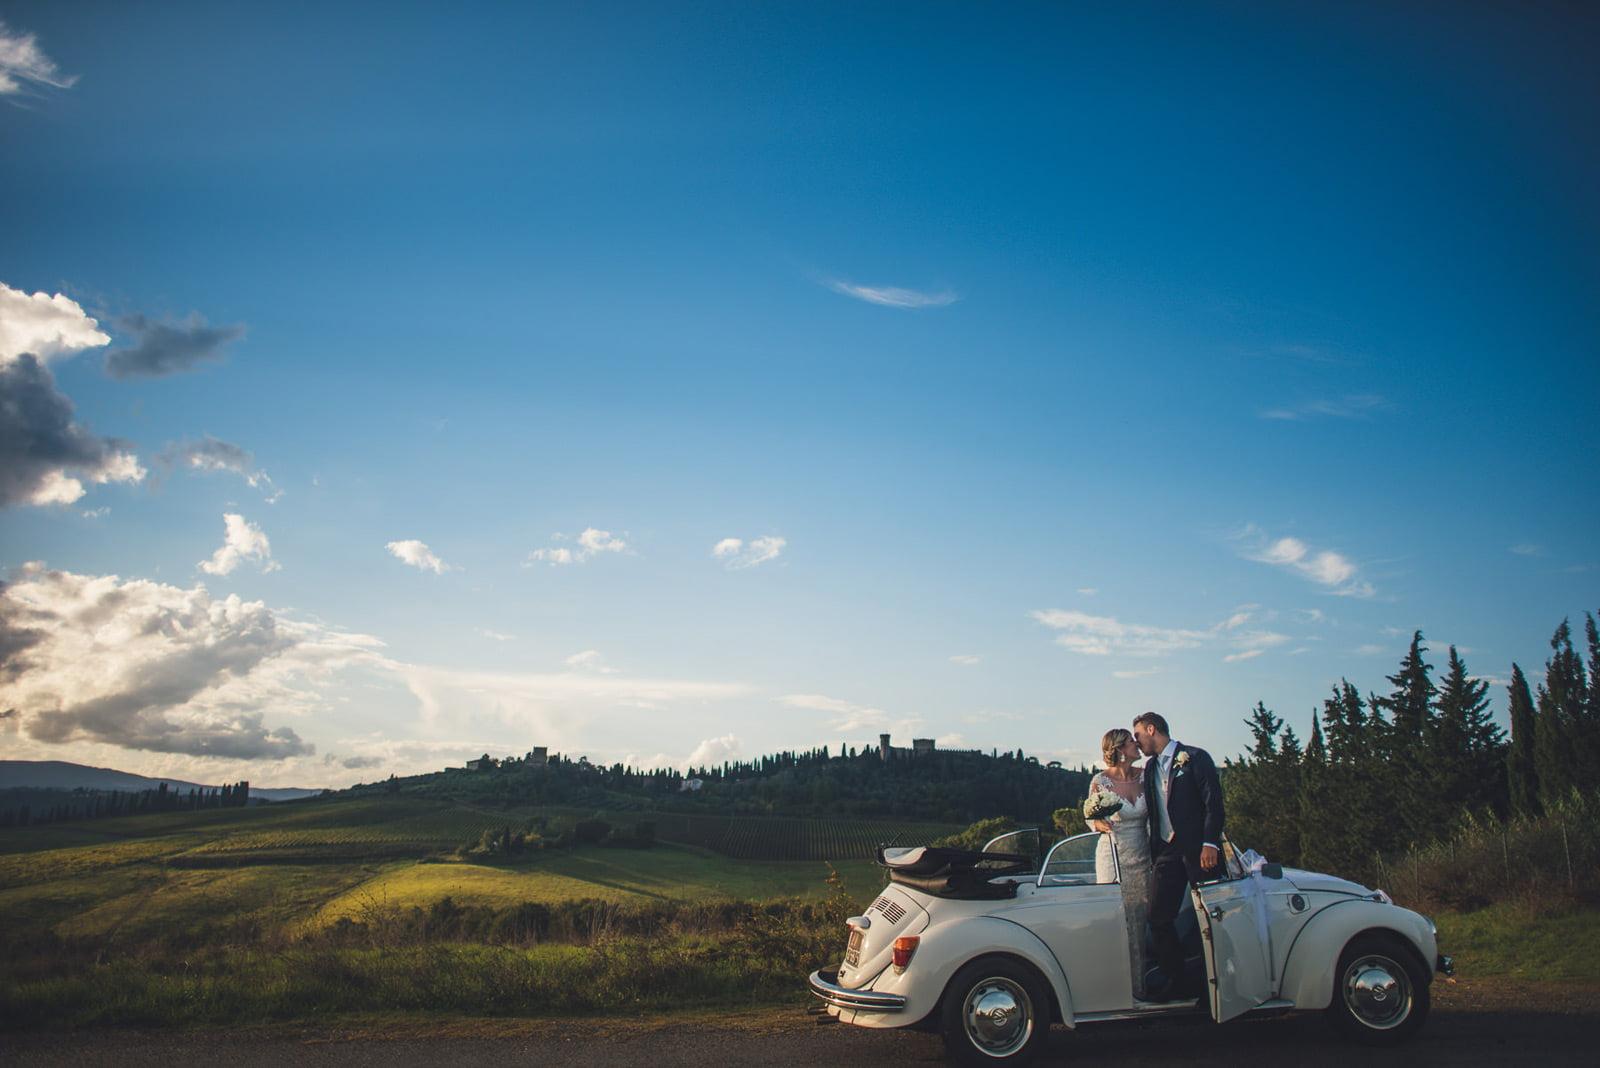 066-wedding-florence-palazzo-borghese